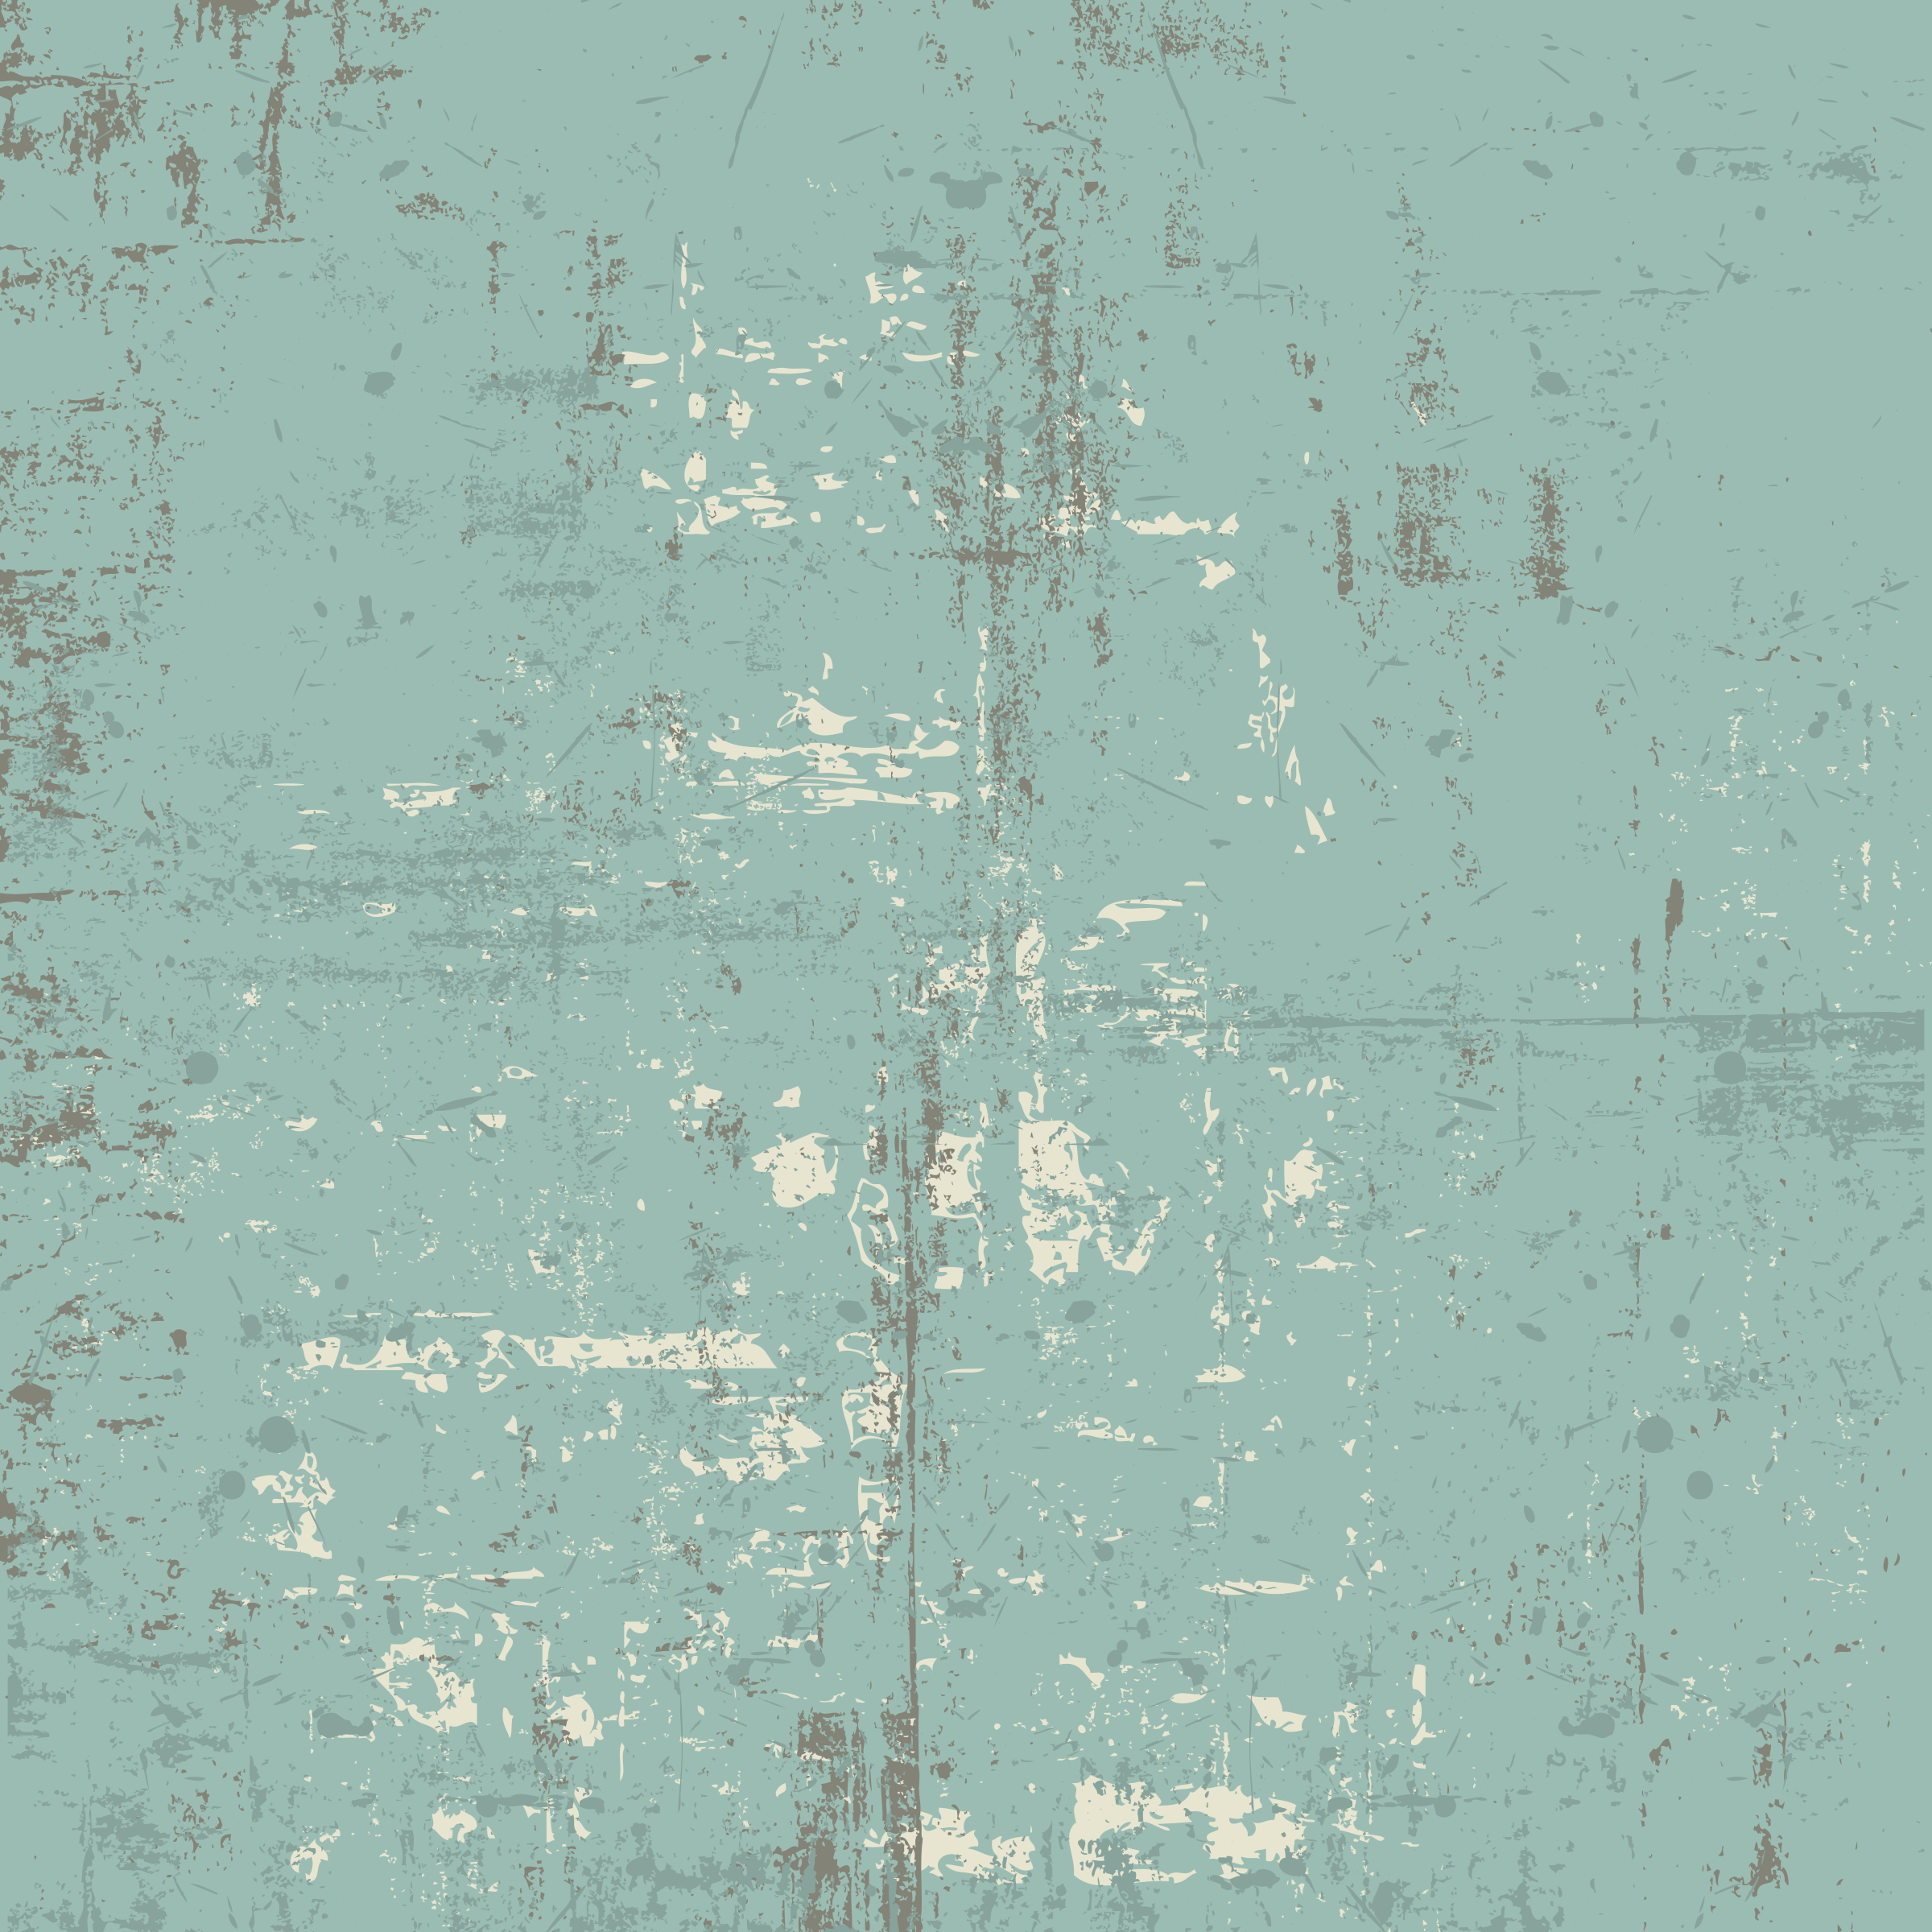 Clipart - Grunge texture